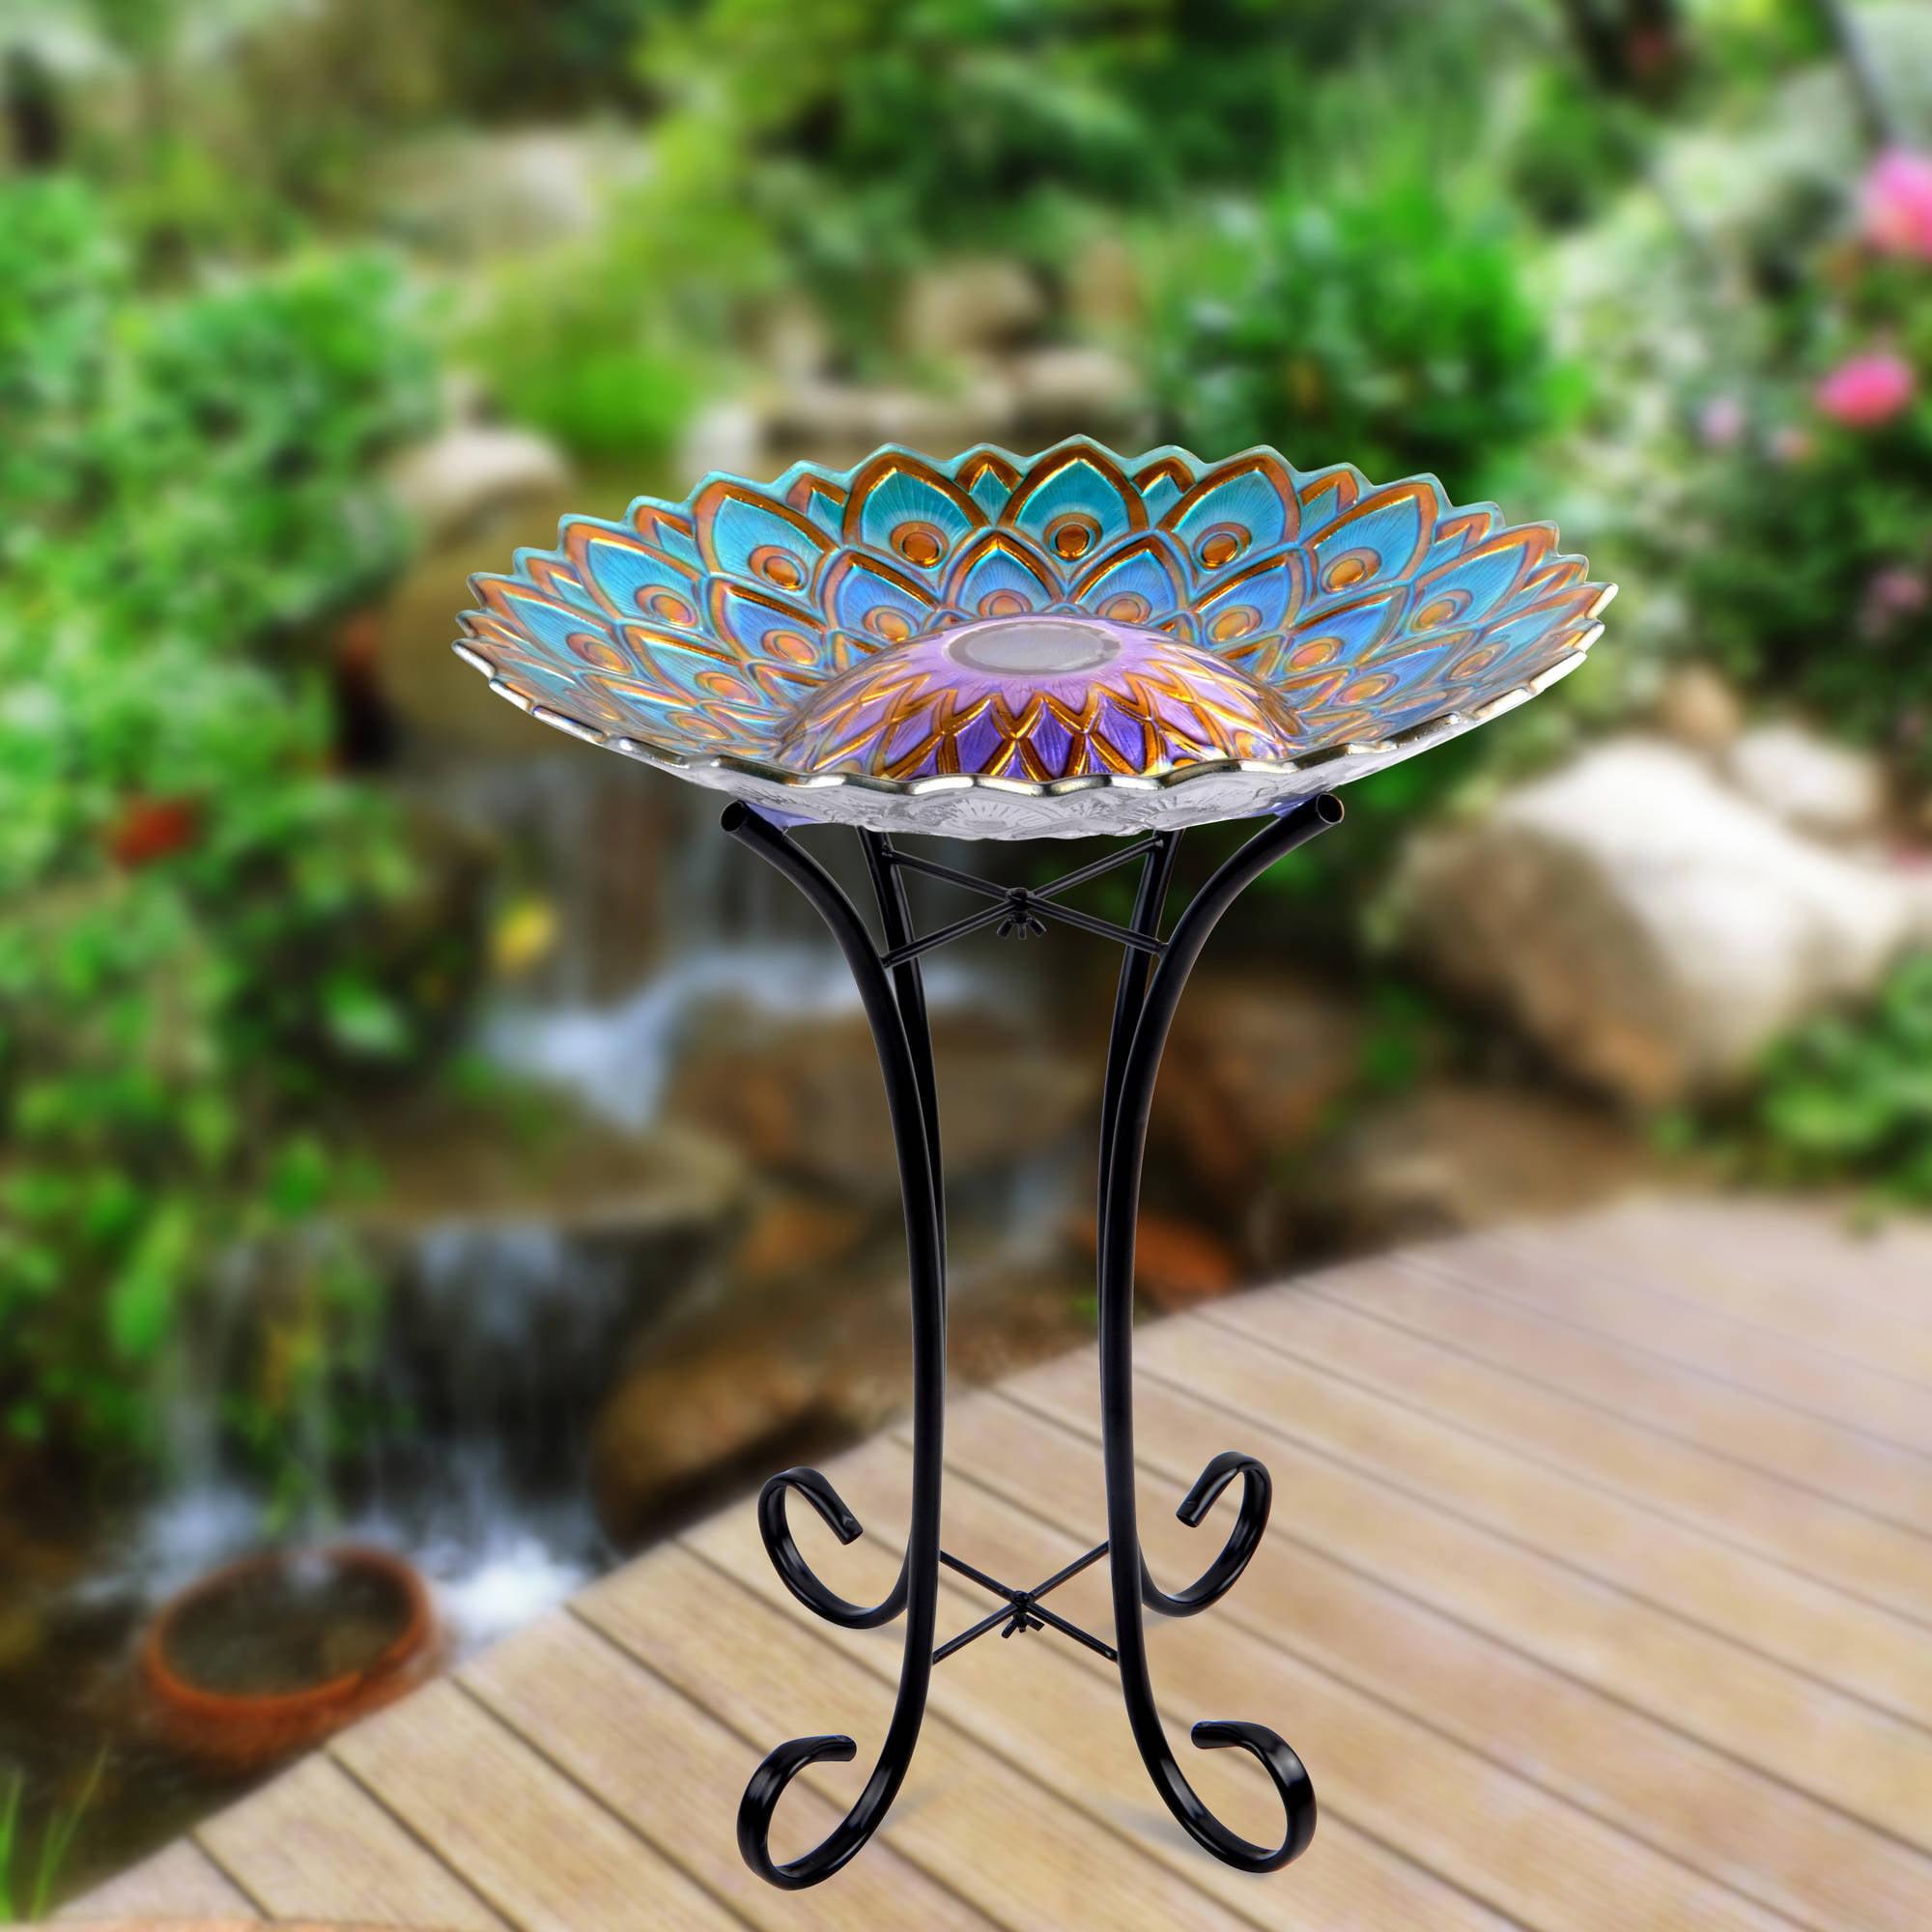 Better Homes and Gardens Solar Birdbath, Blue by Quanzhou Viition Gifts Co., LTD